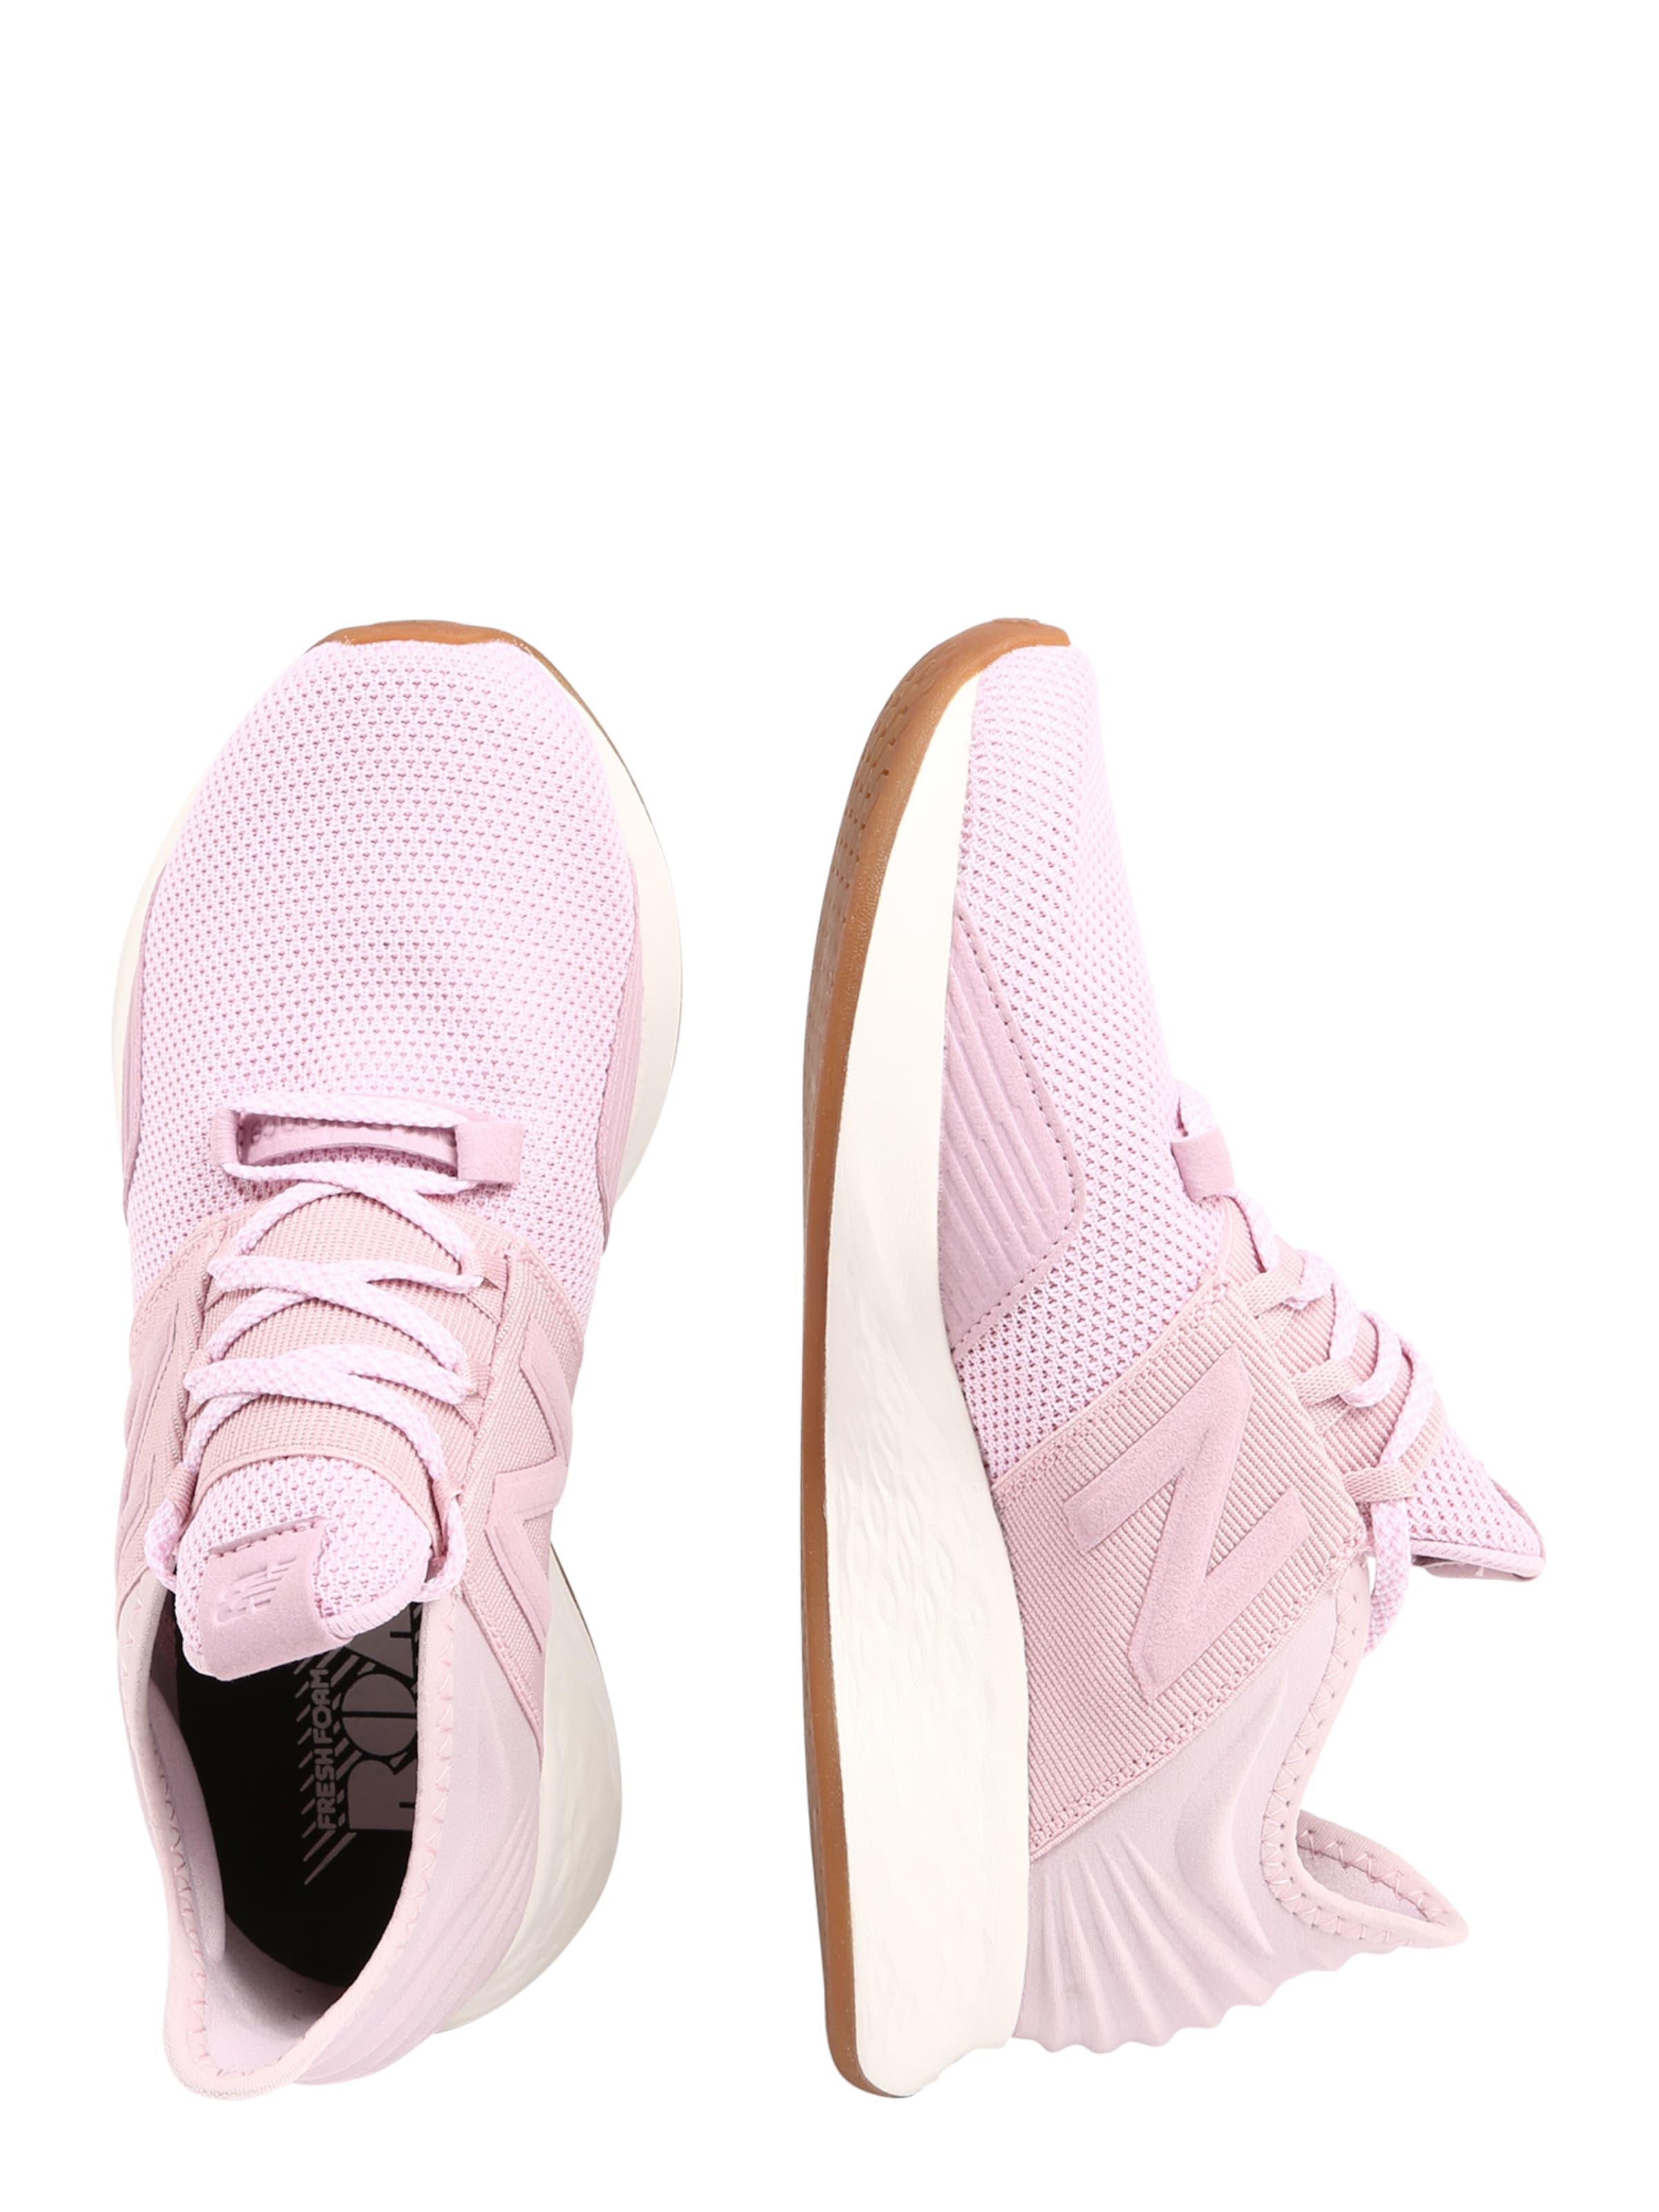 In schuh Pack' New 'roav Knit Rosa Balance Sport xrdshQCt